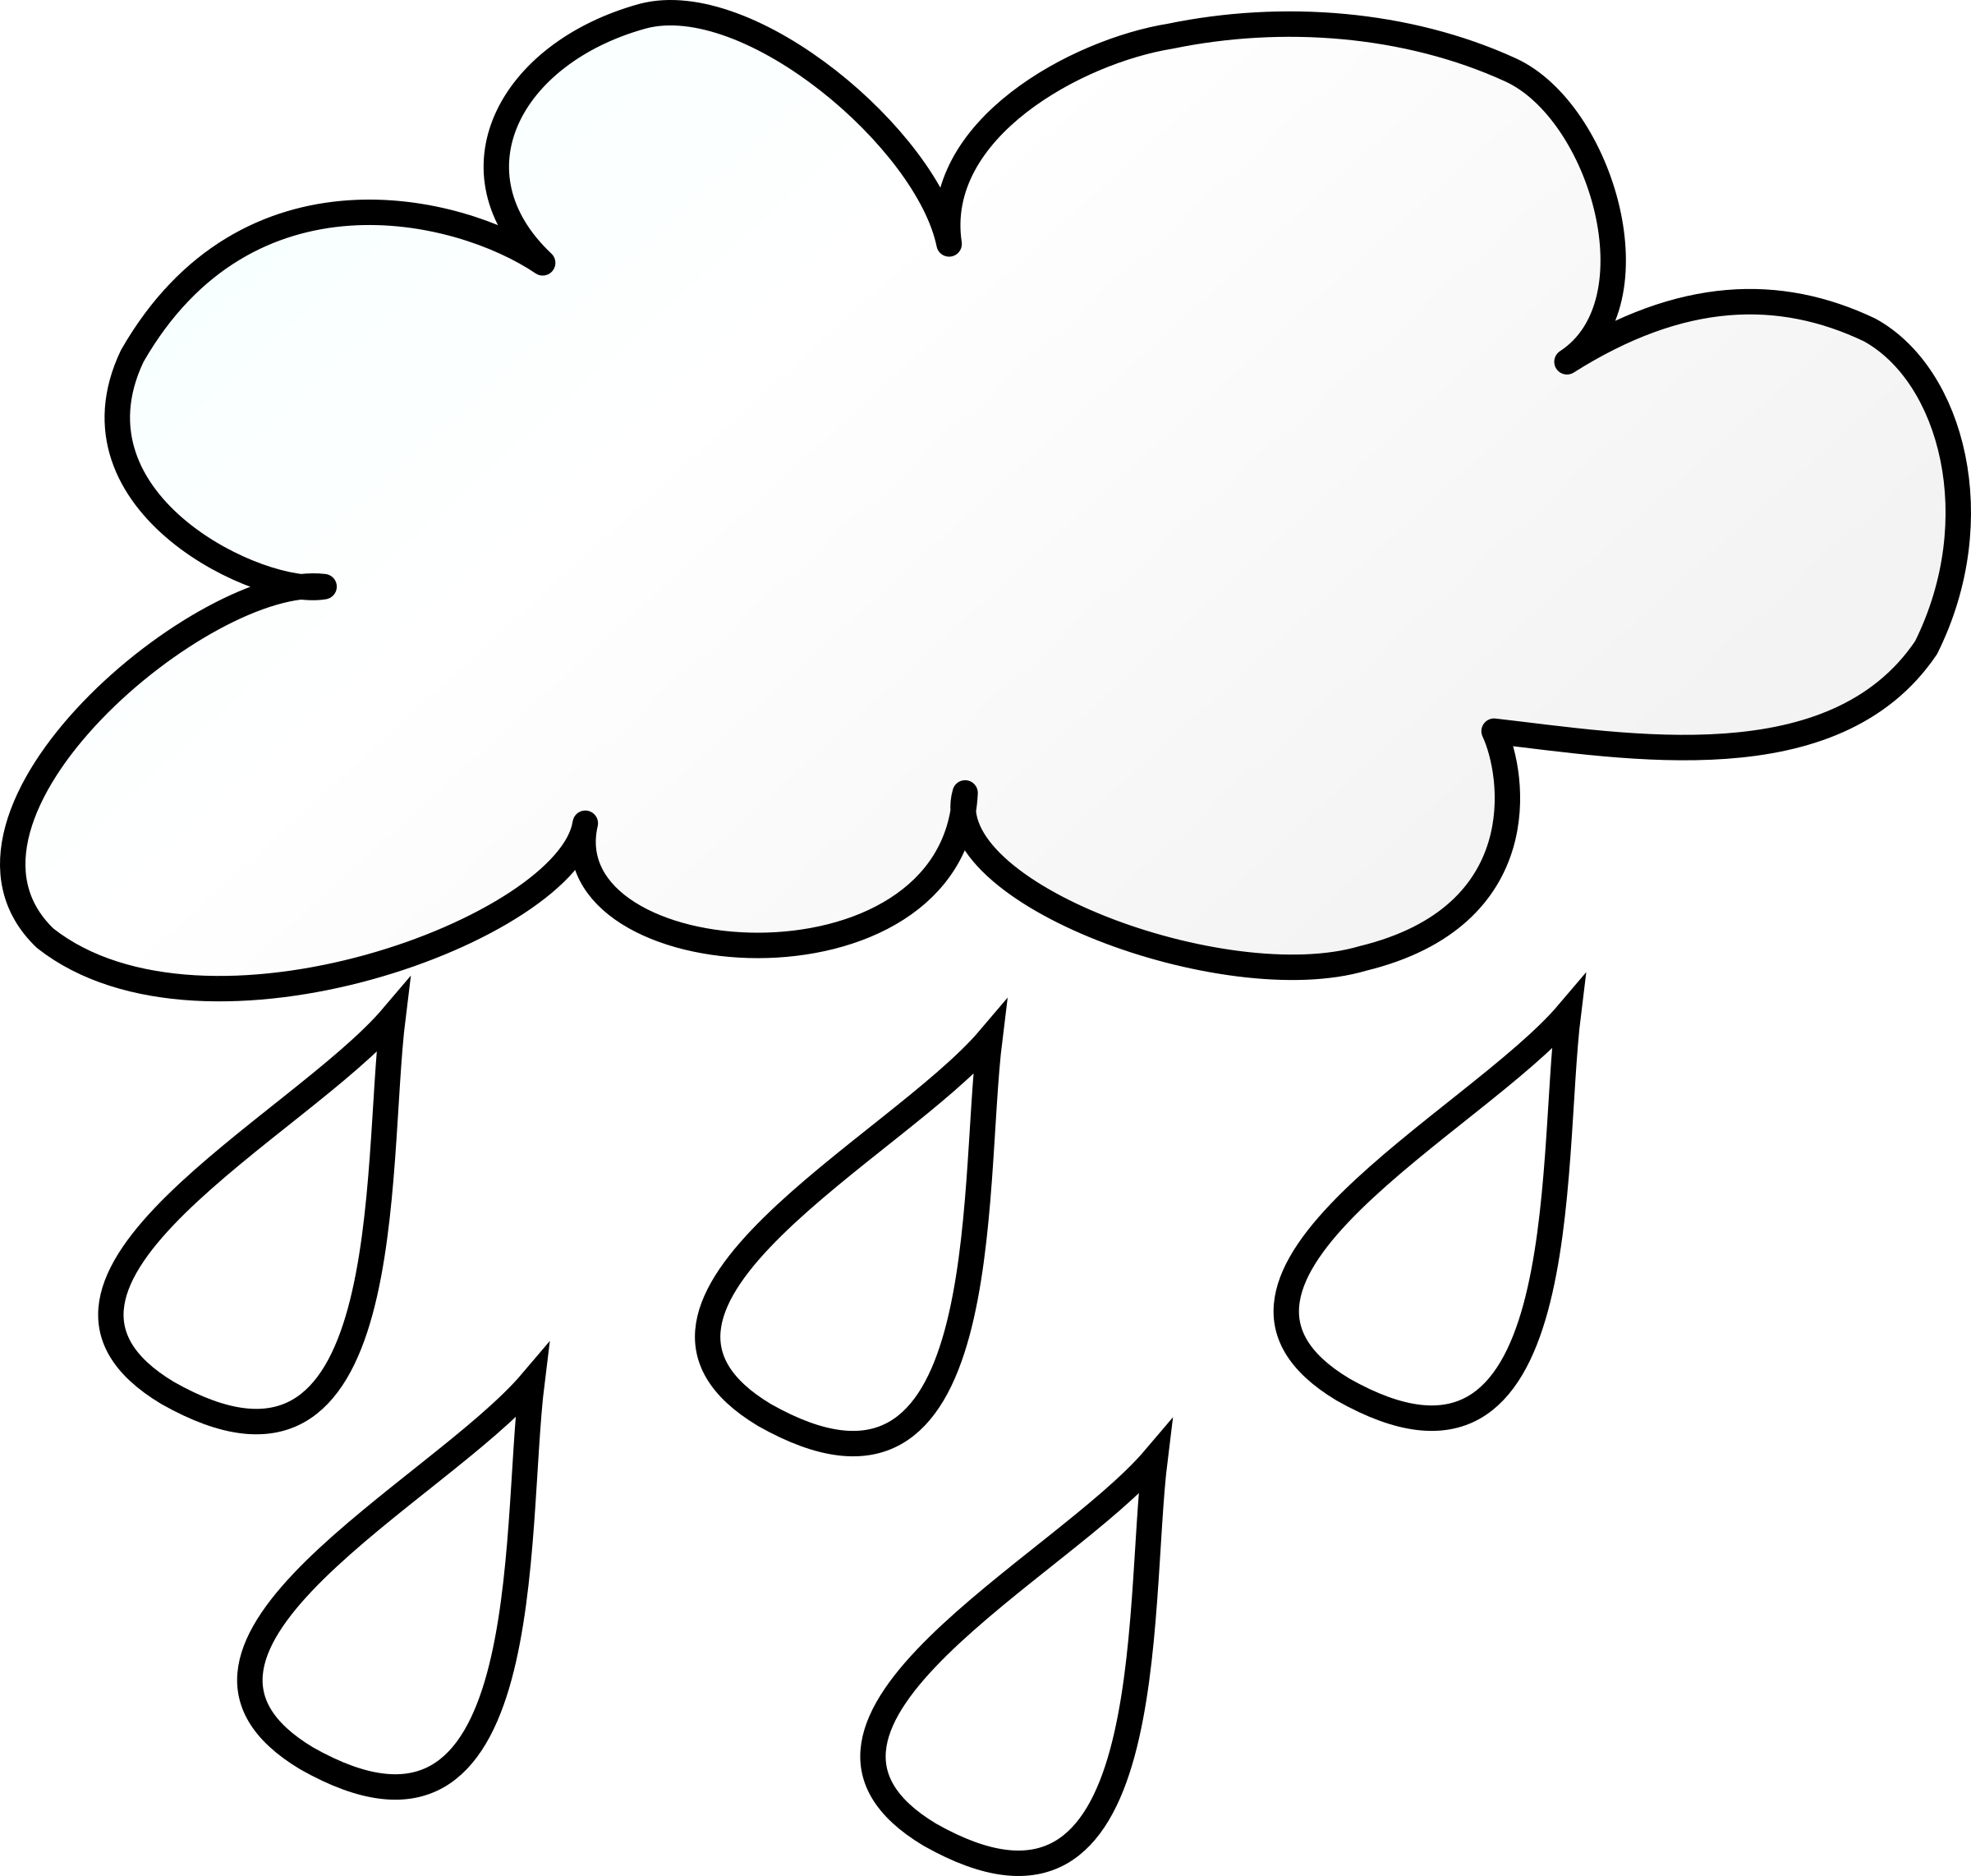 Clipart rain black and white. Line art big image